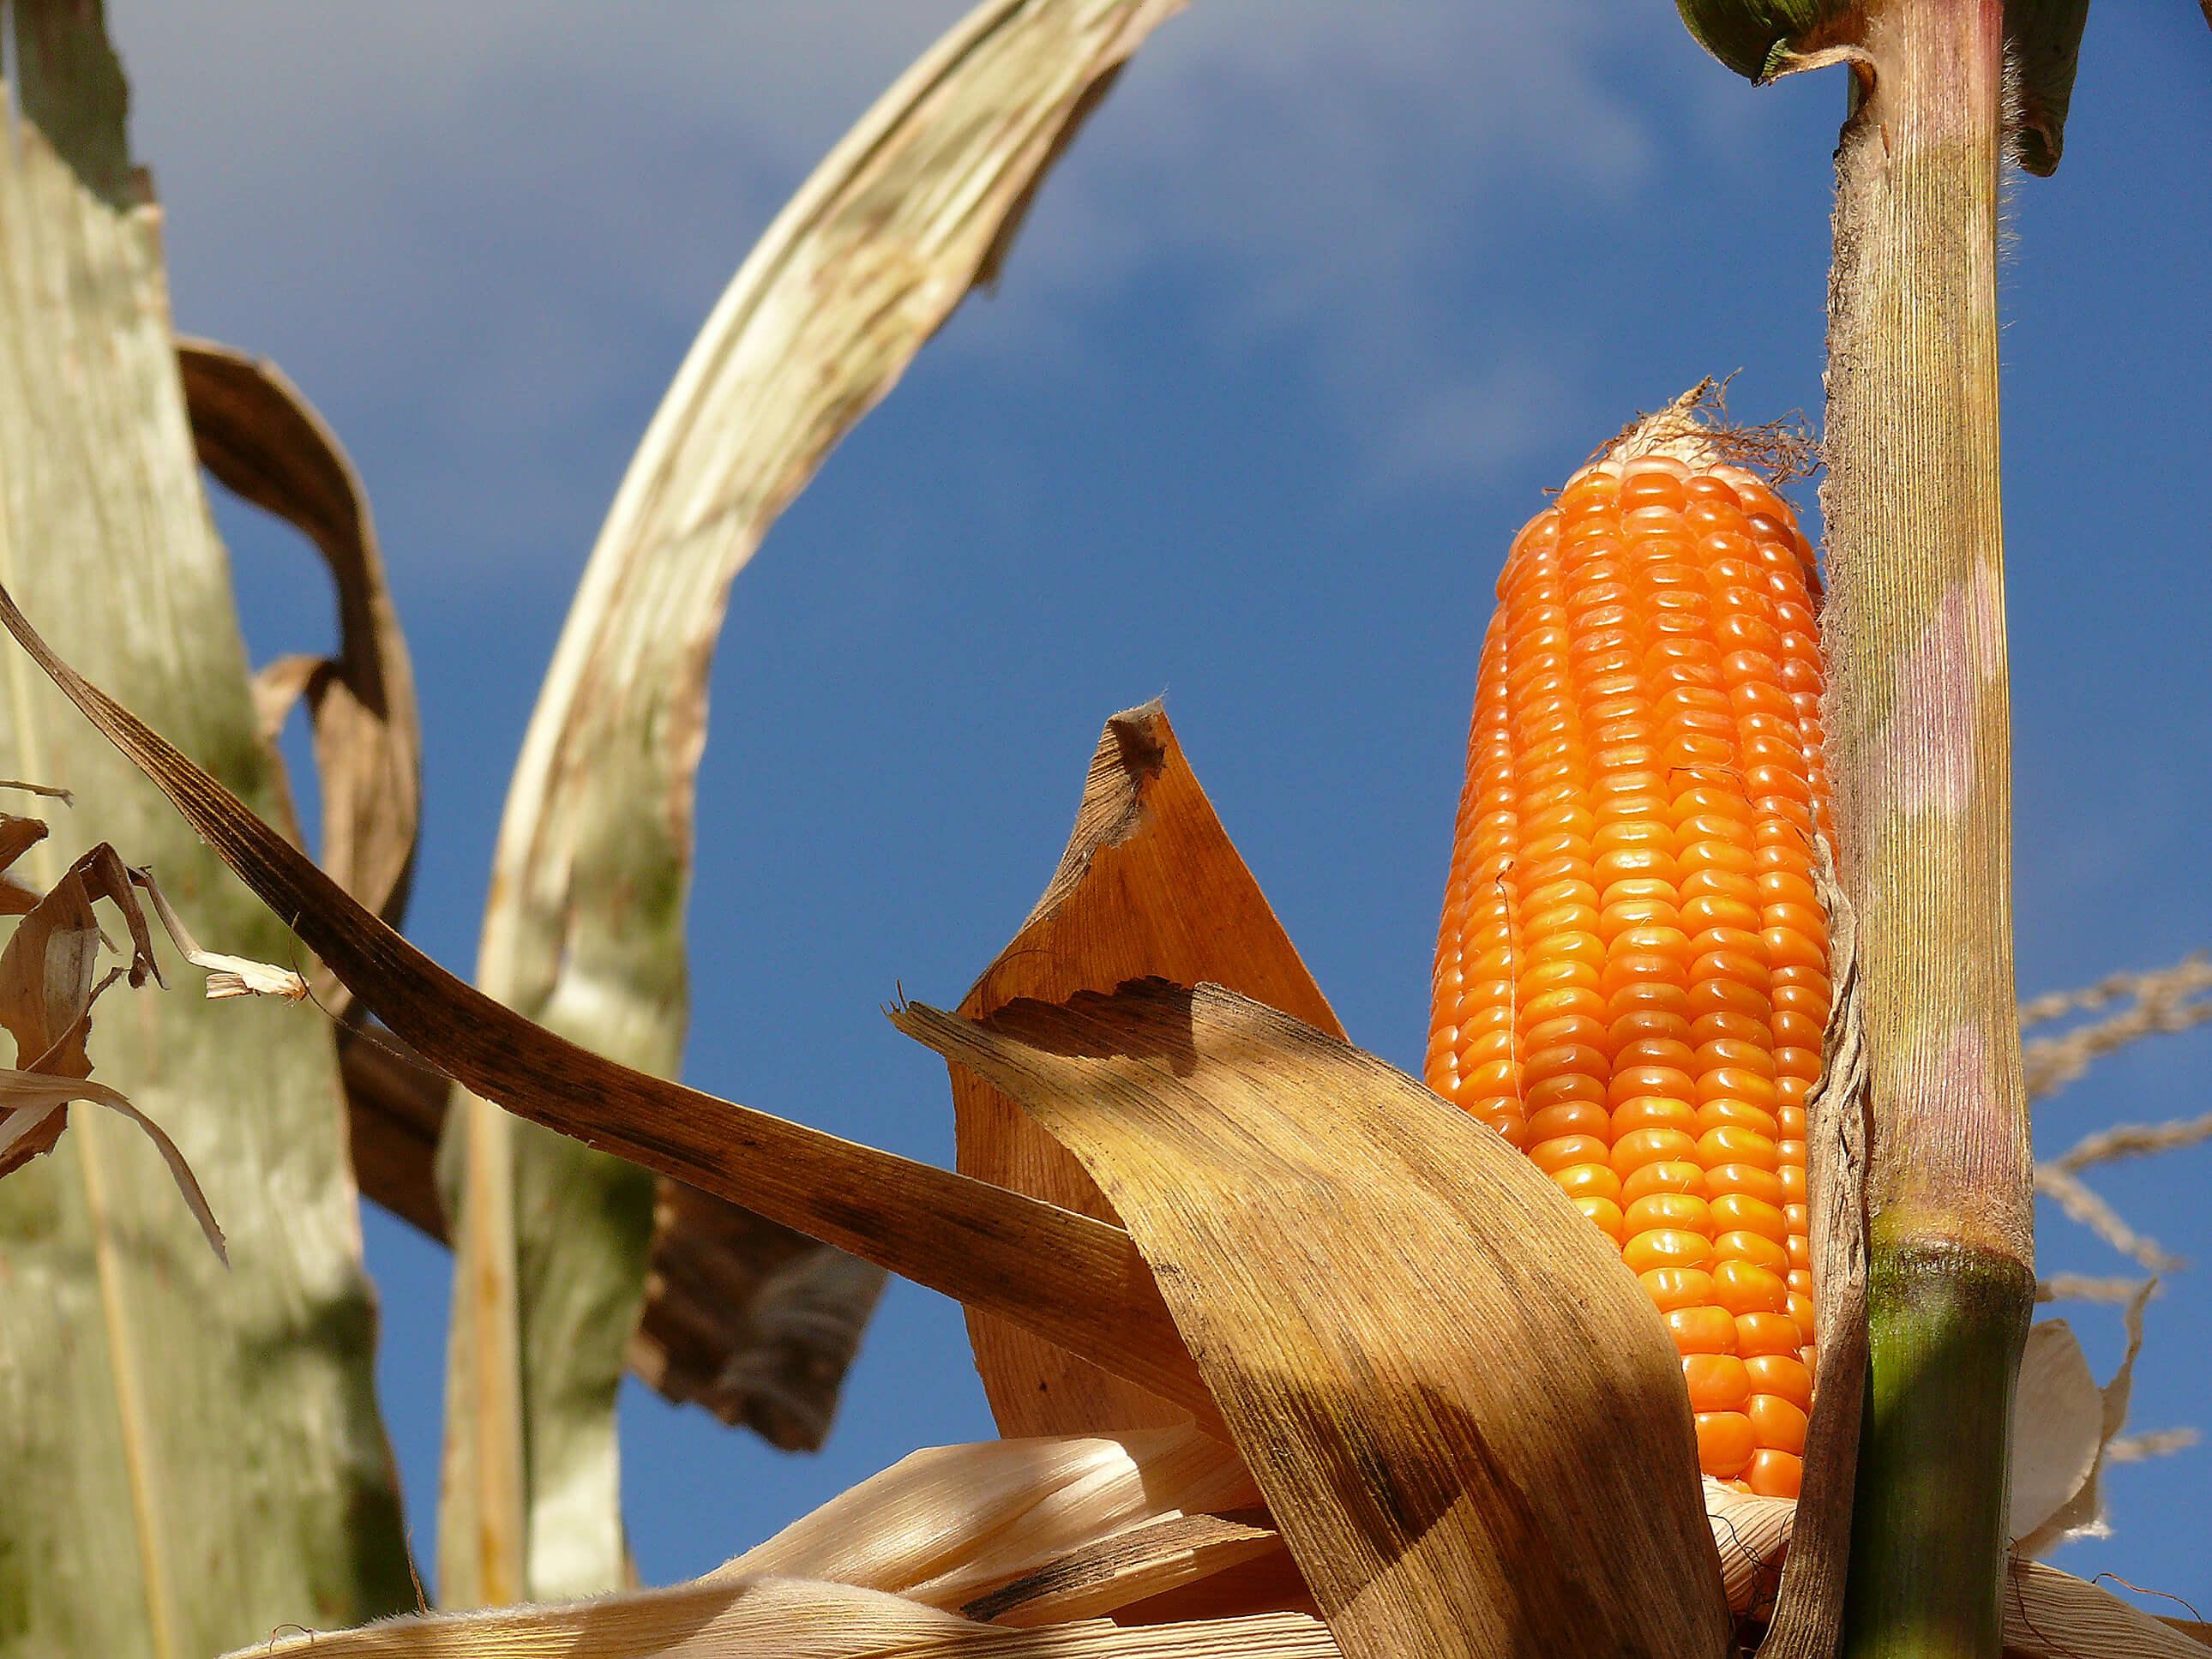 Michael Torbert Attain Rocheford Corn